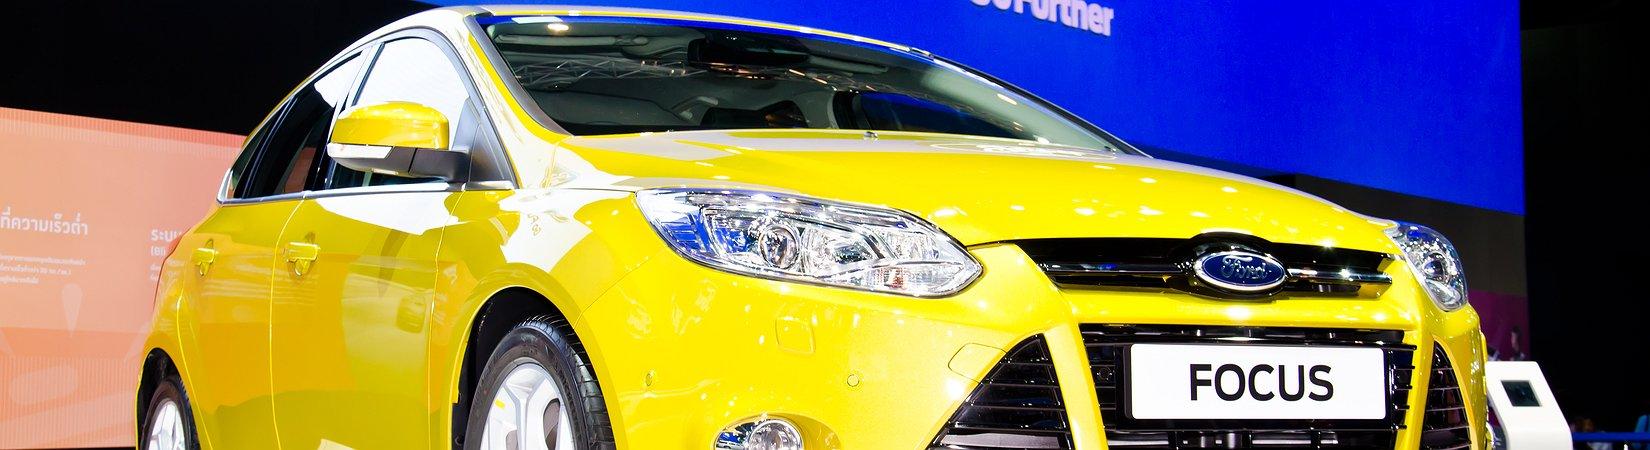 Ford переносит производство Focus в Китай